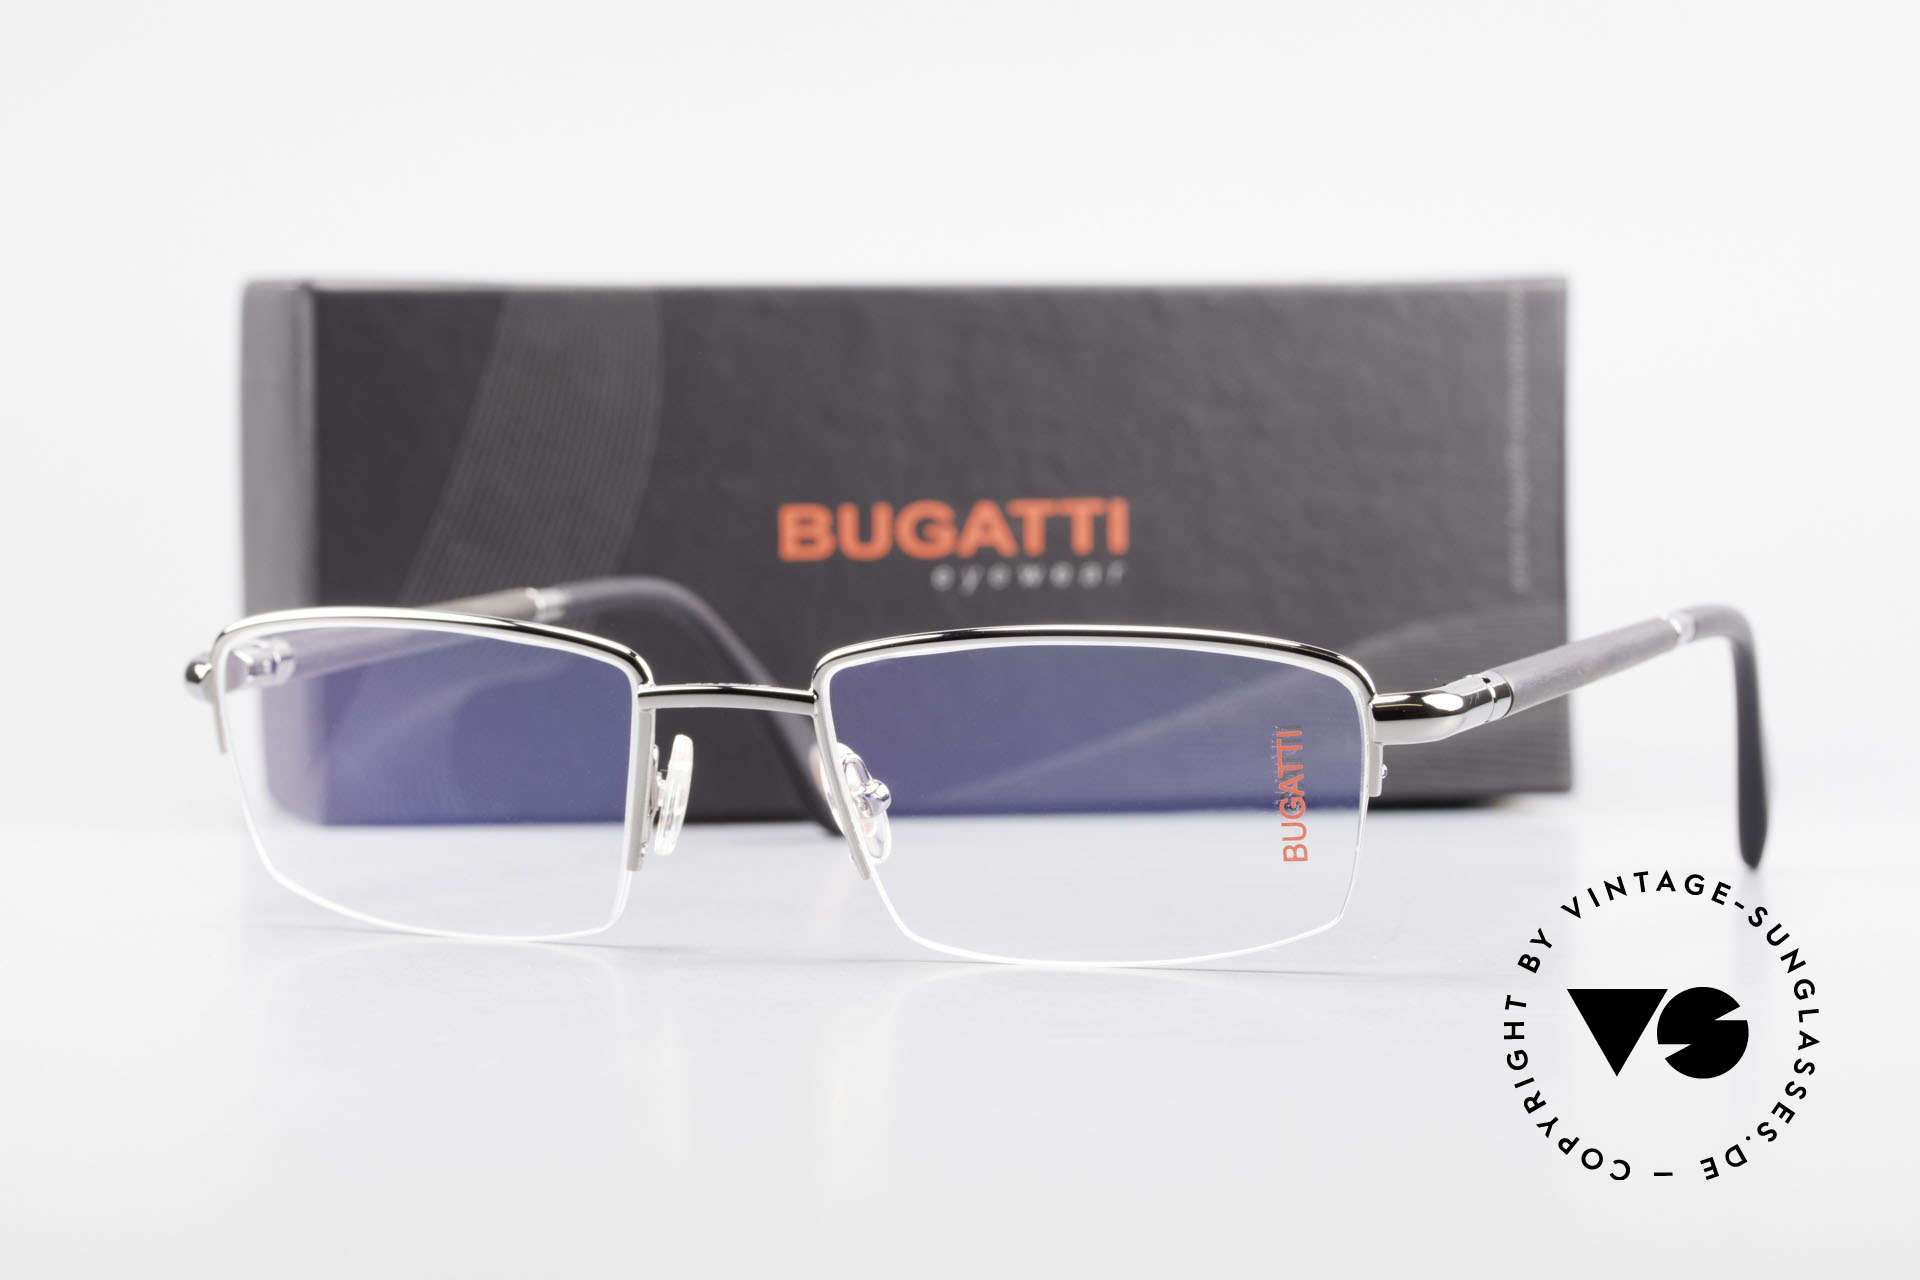 Bugatti 535 Horn Nylor Glasses Palladium, Size: medium, Made for Men